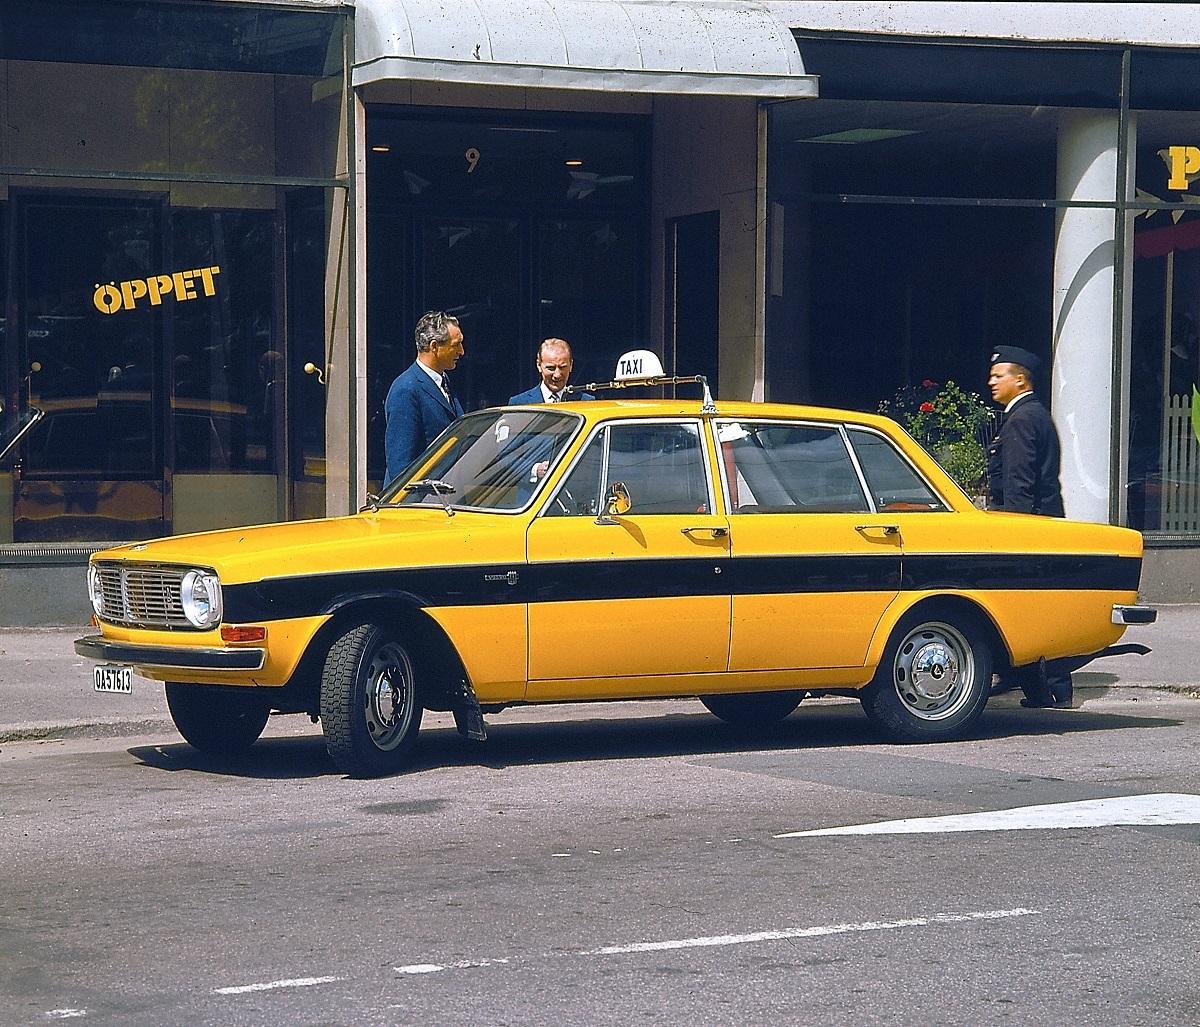 volvo-144-taxi-sweden